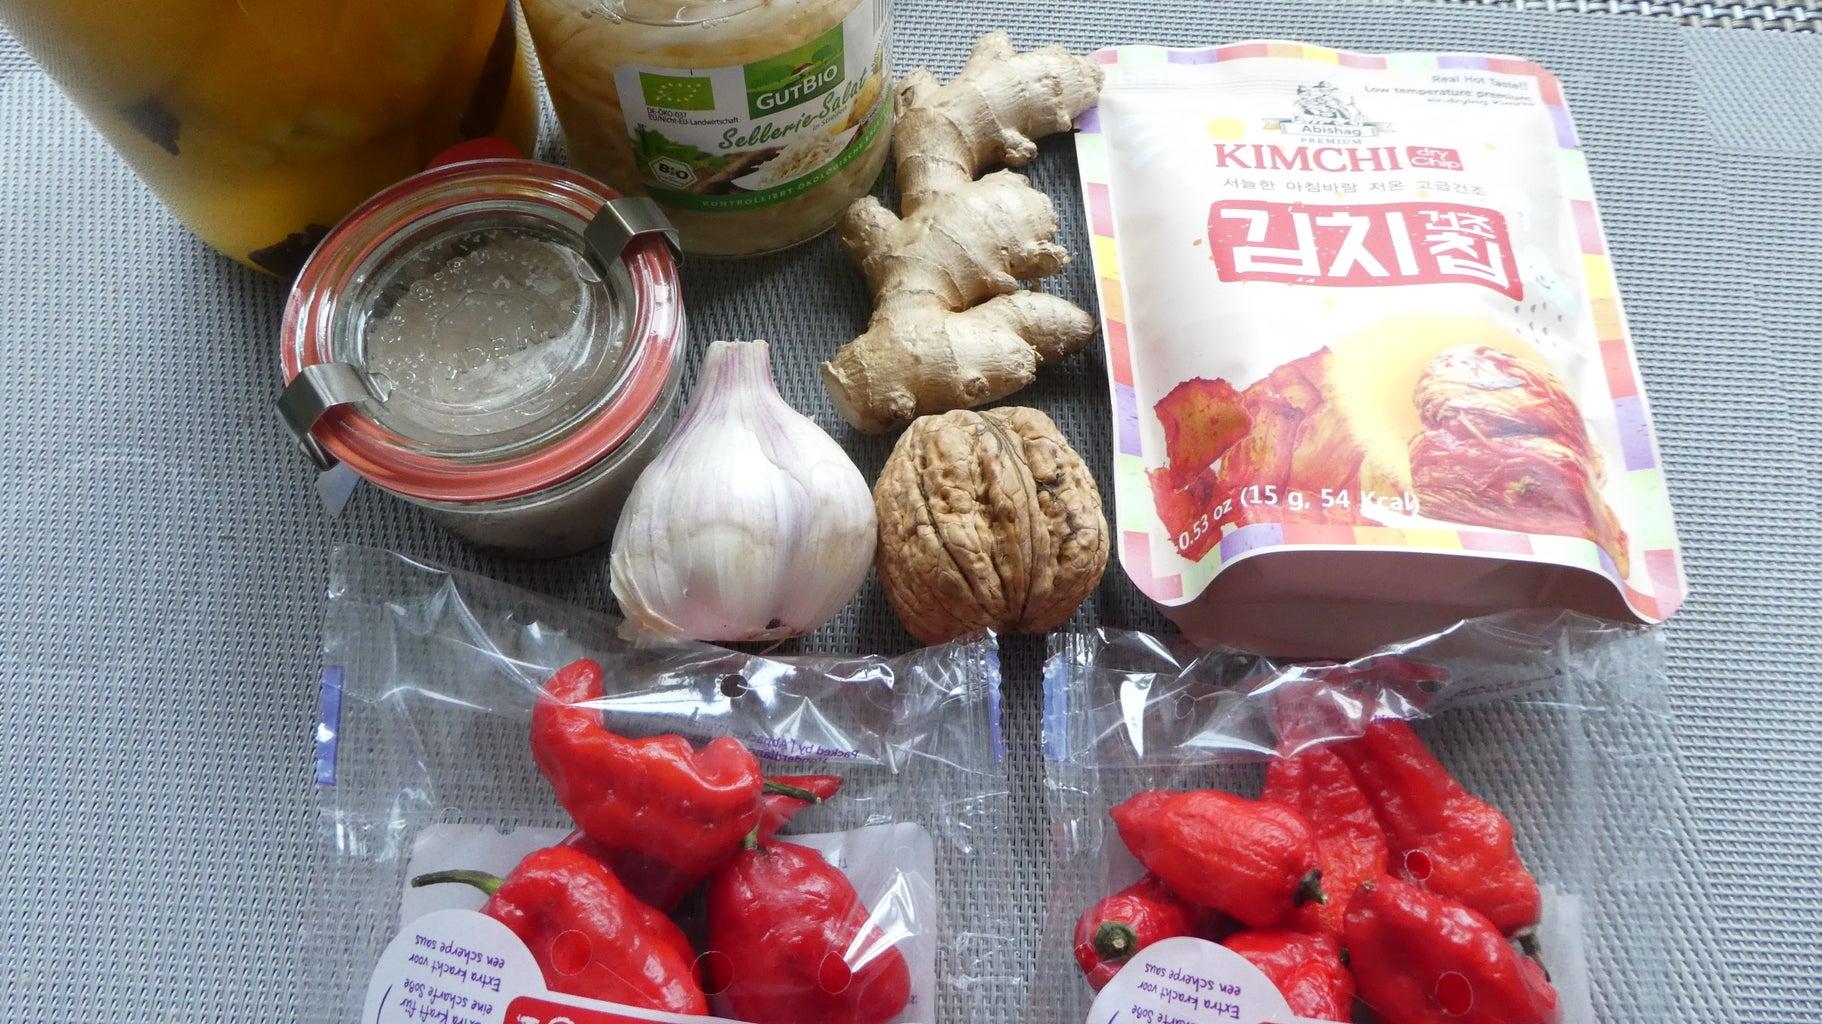 Jolokimchi Chili Sauce